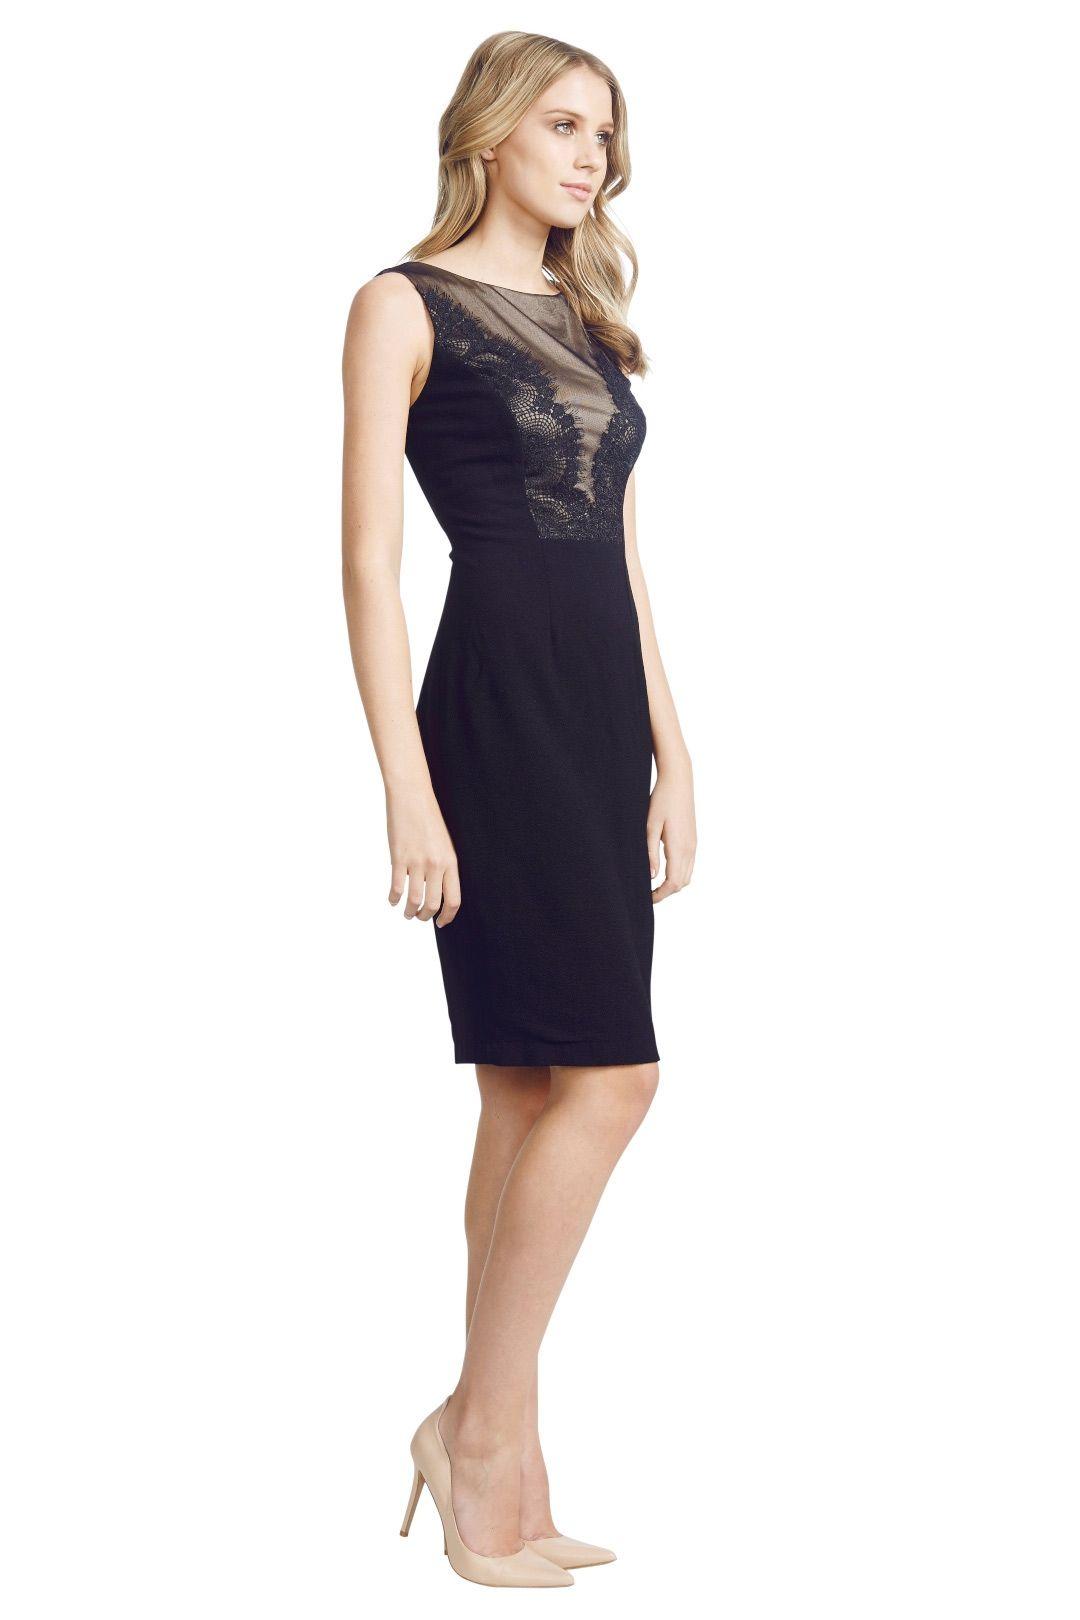 David  Meister  - Lace Panel Dress - Black - Side